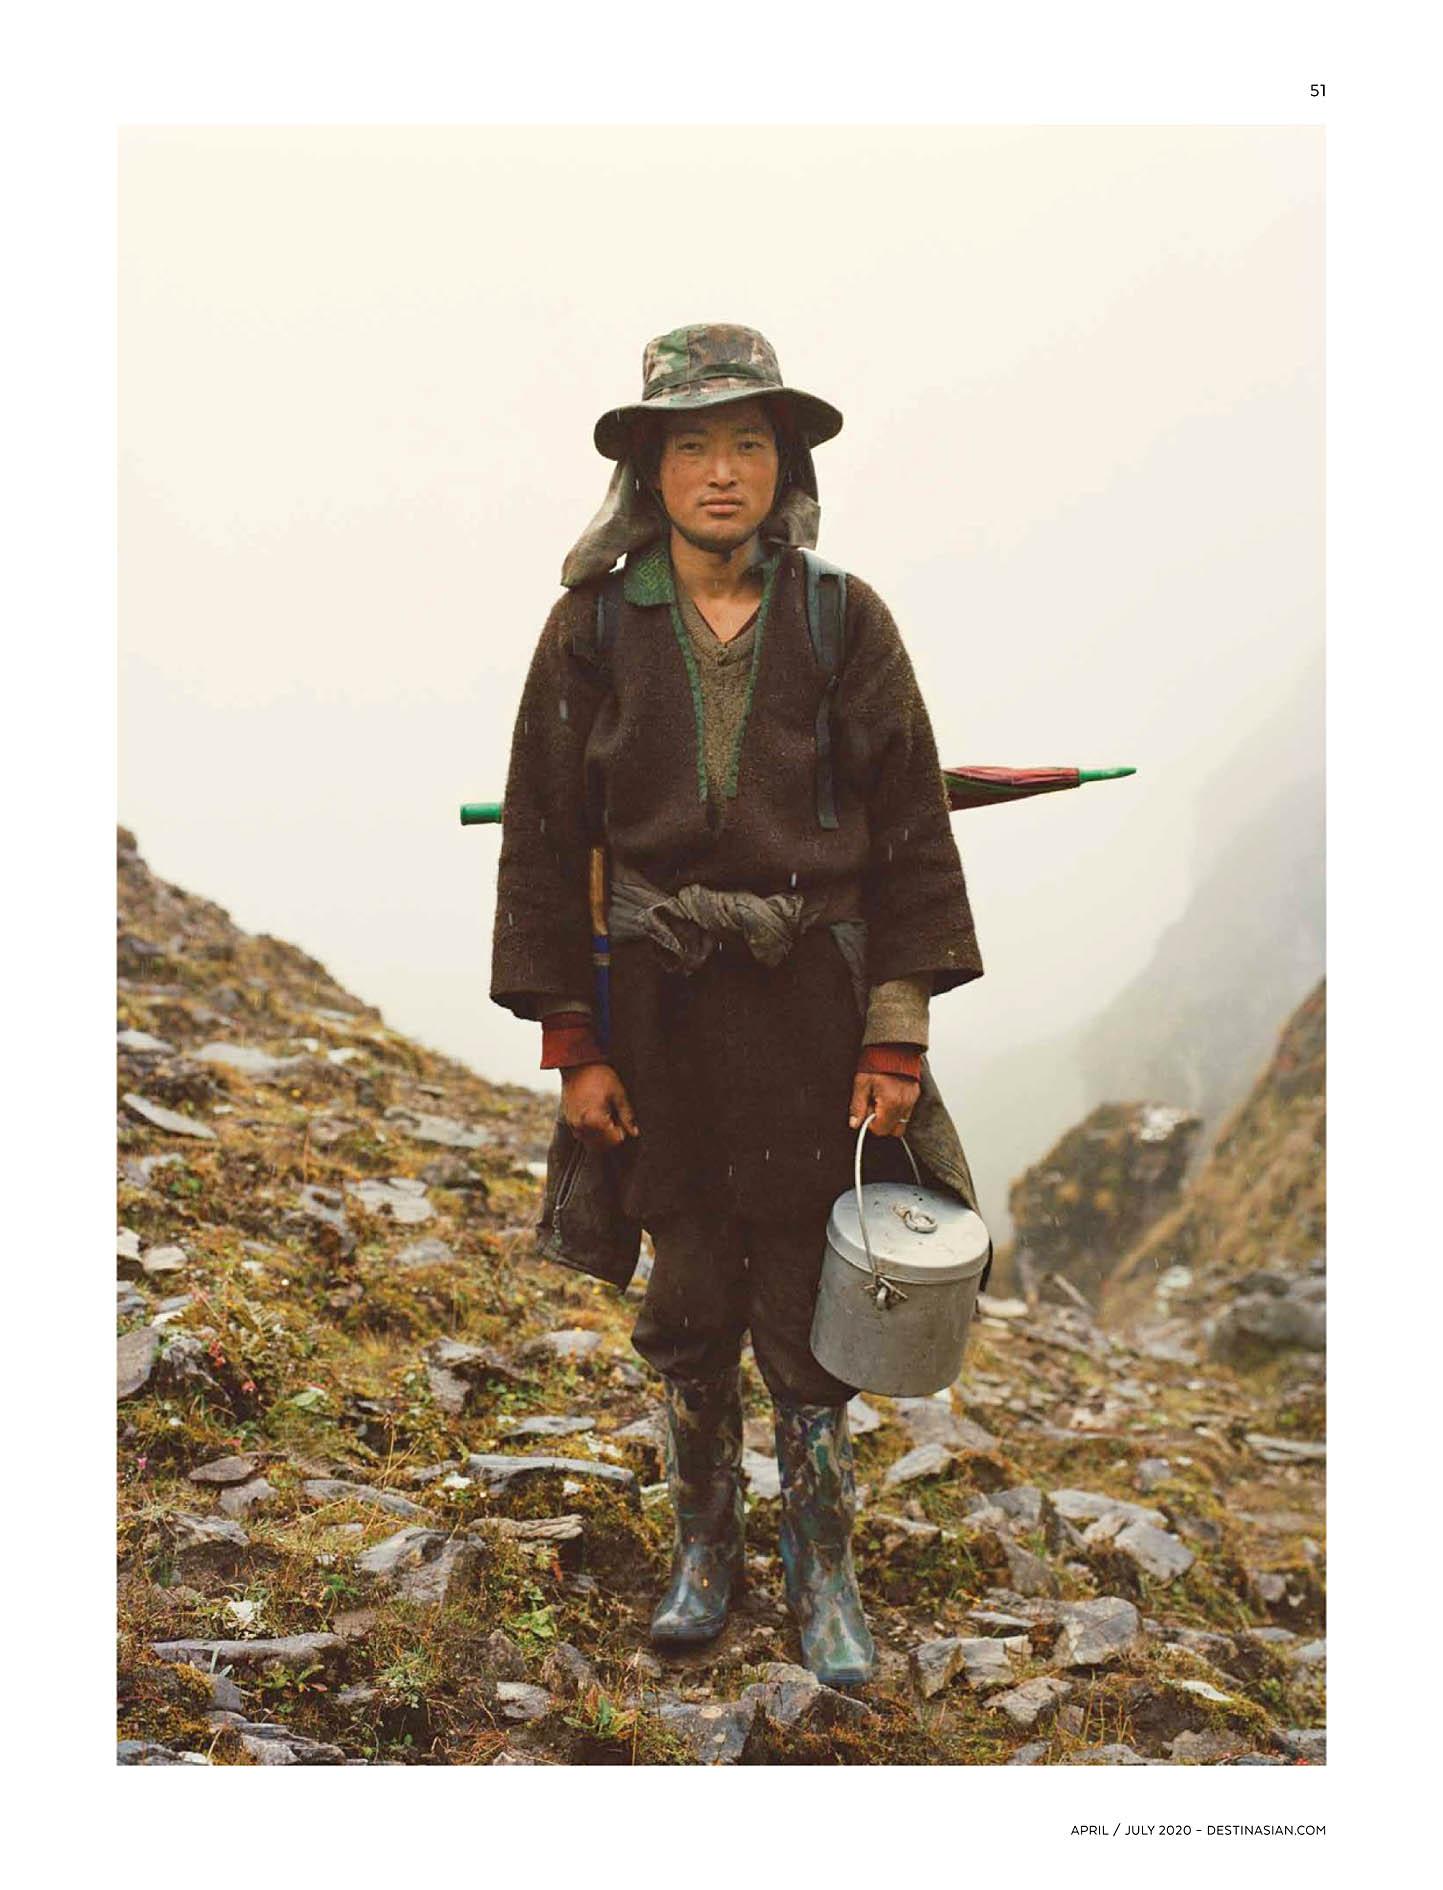 DestinAsian 2020-04-07 Bhutan 05.jpg